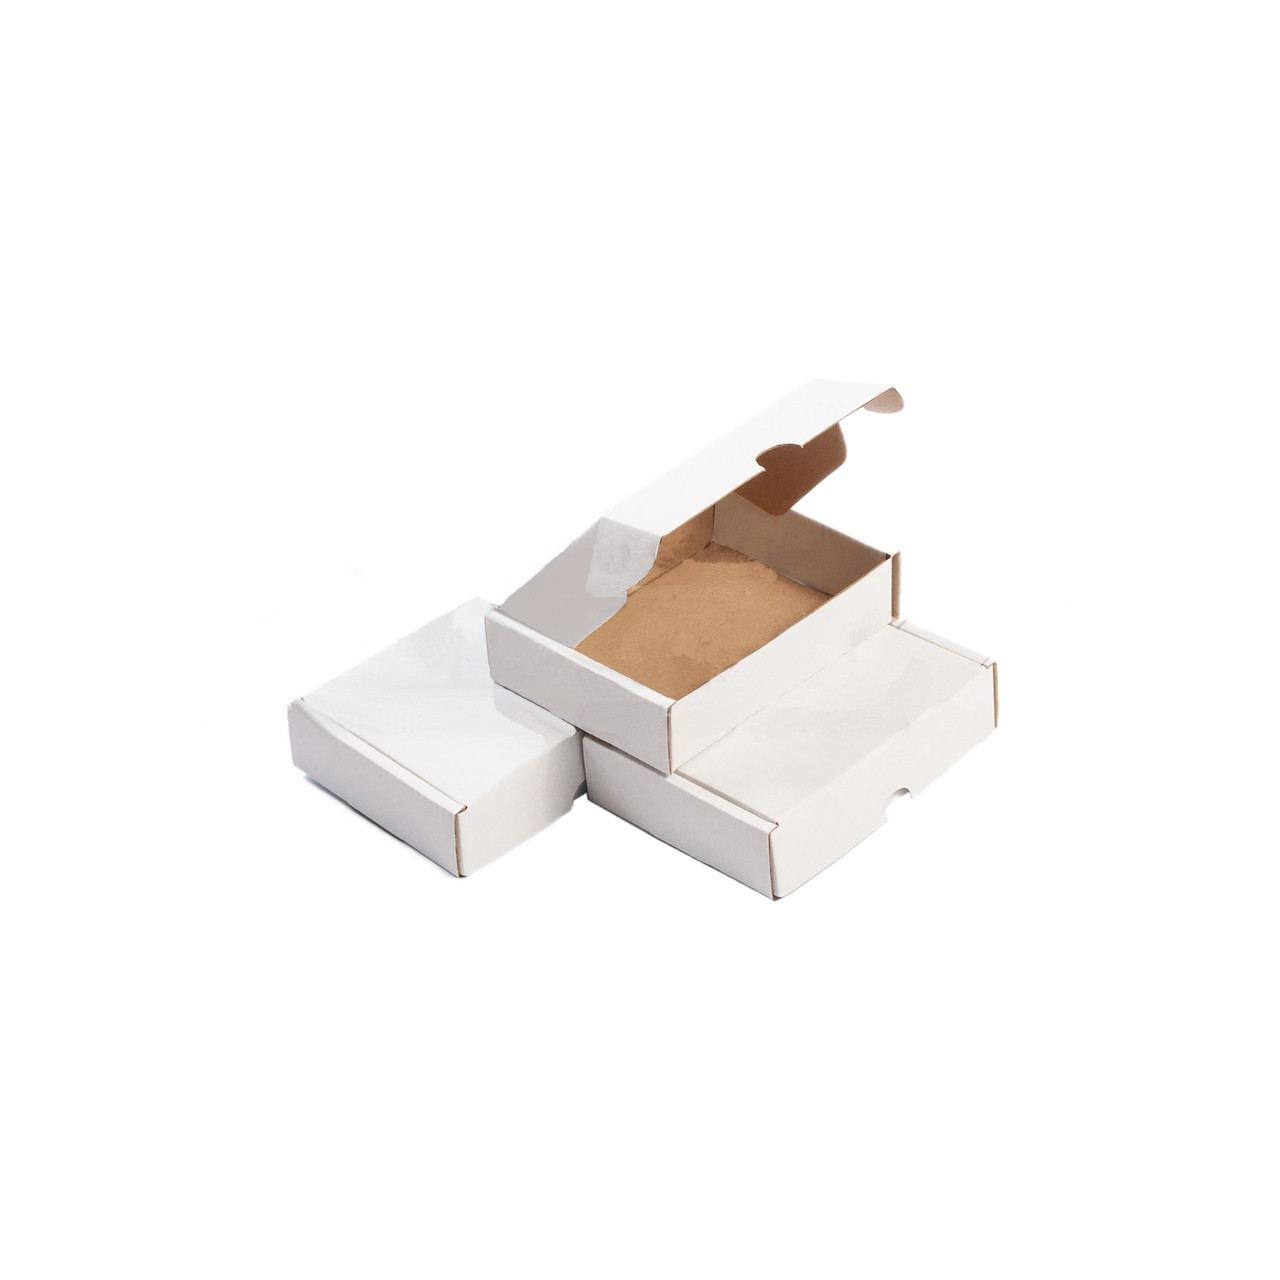 Картонная упаковка 400х260х60, мм. белая